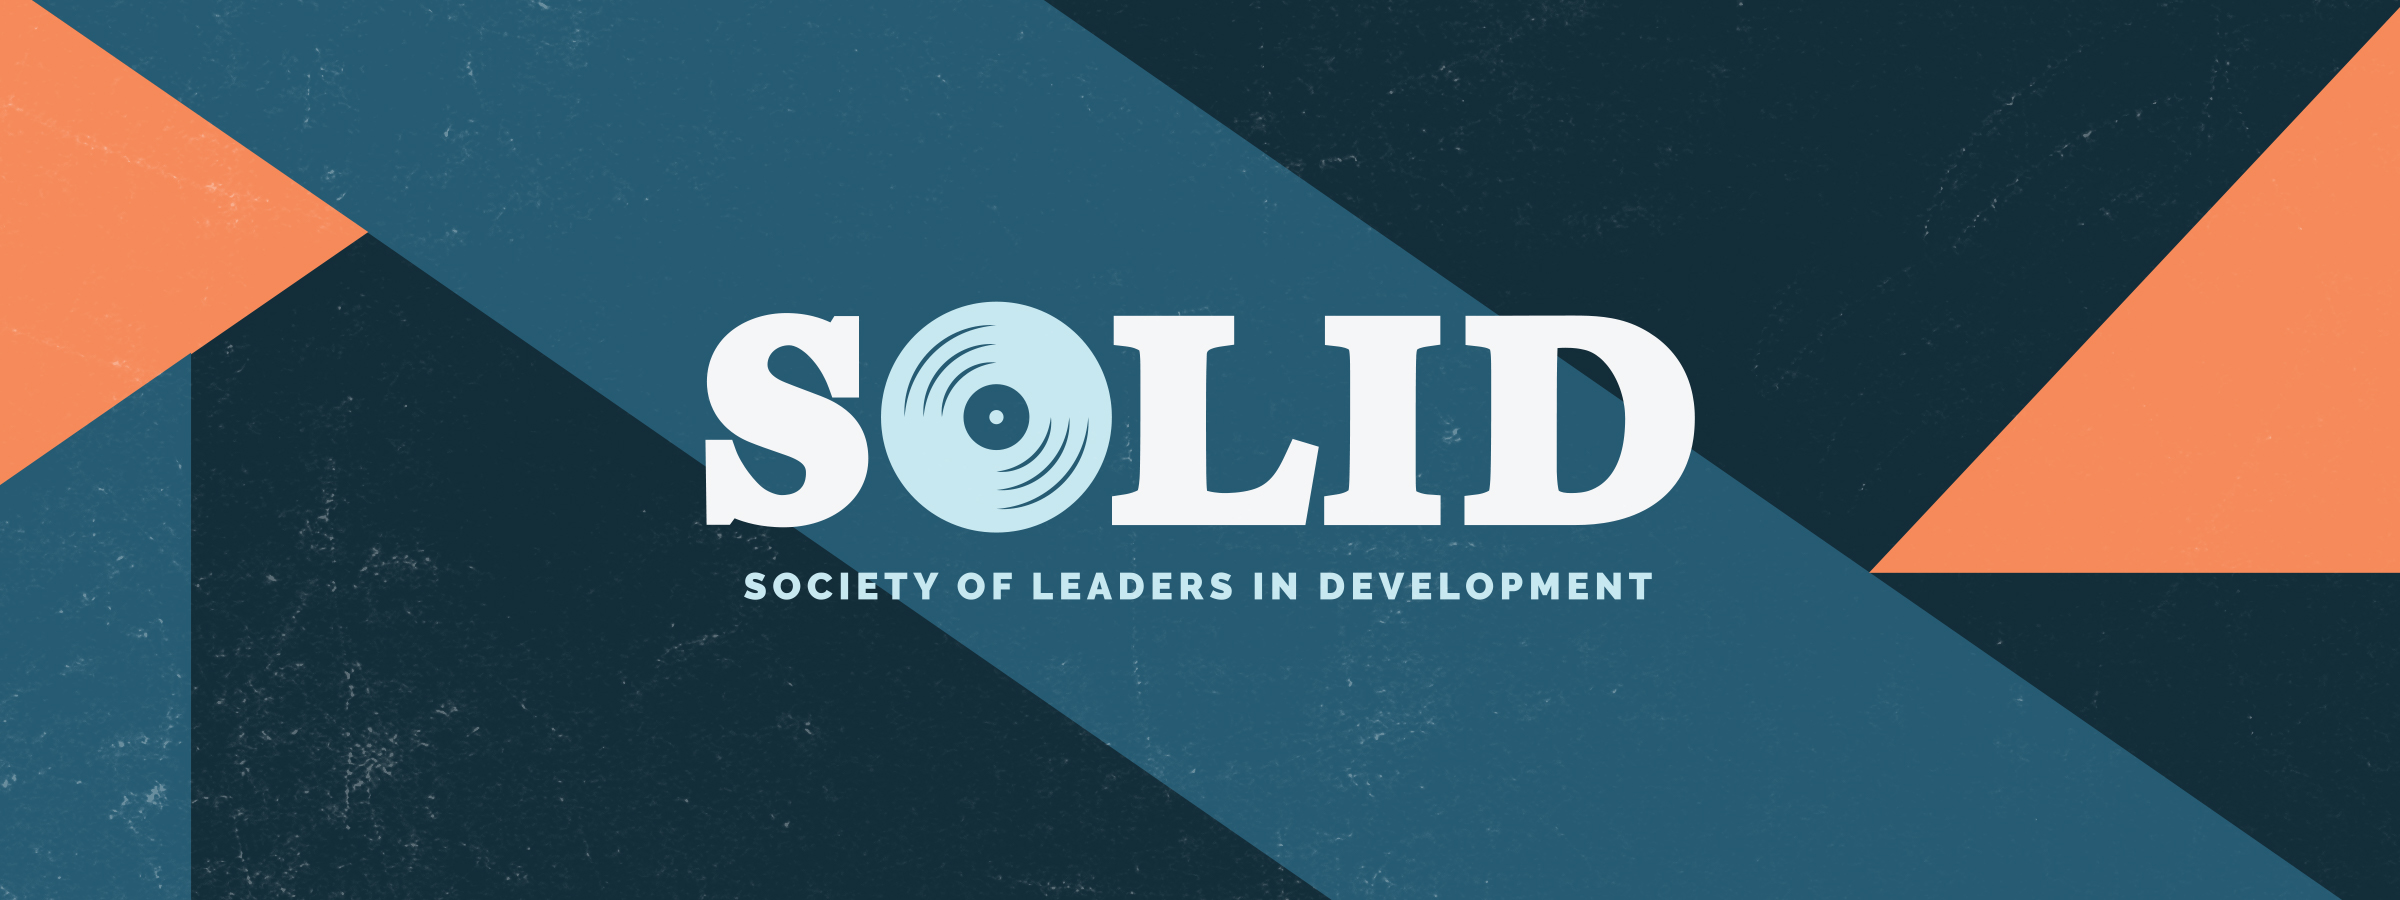 SOLID-Carousel-01.jpg